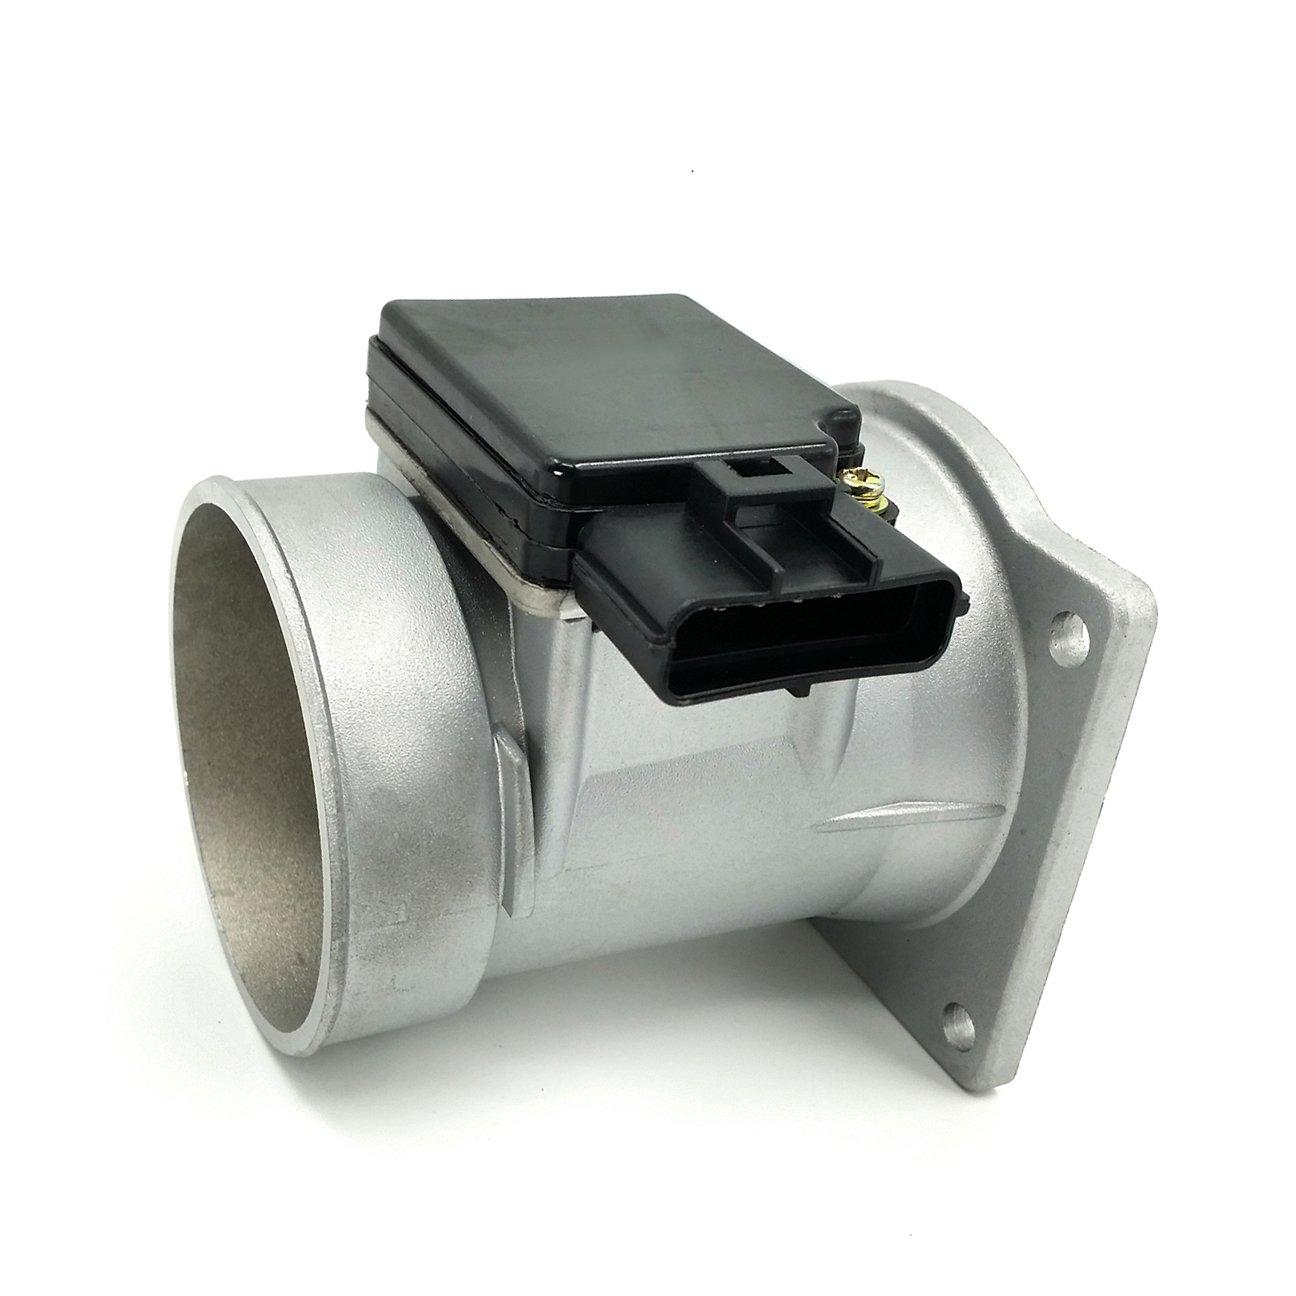 SKP SK2451039 Mass Air Flow Sensor, 1 Pack